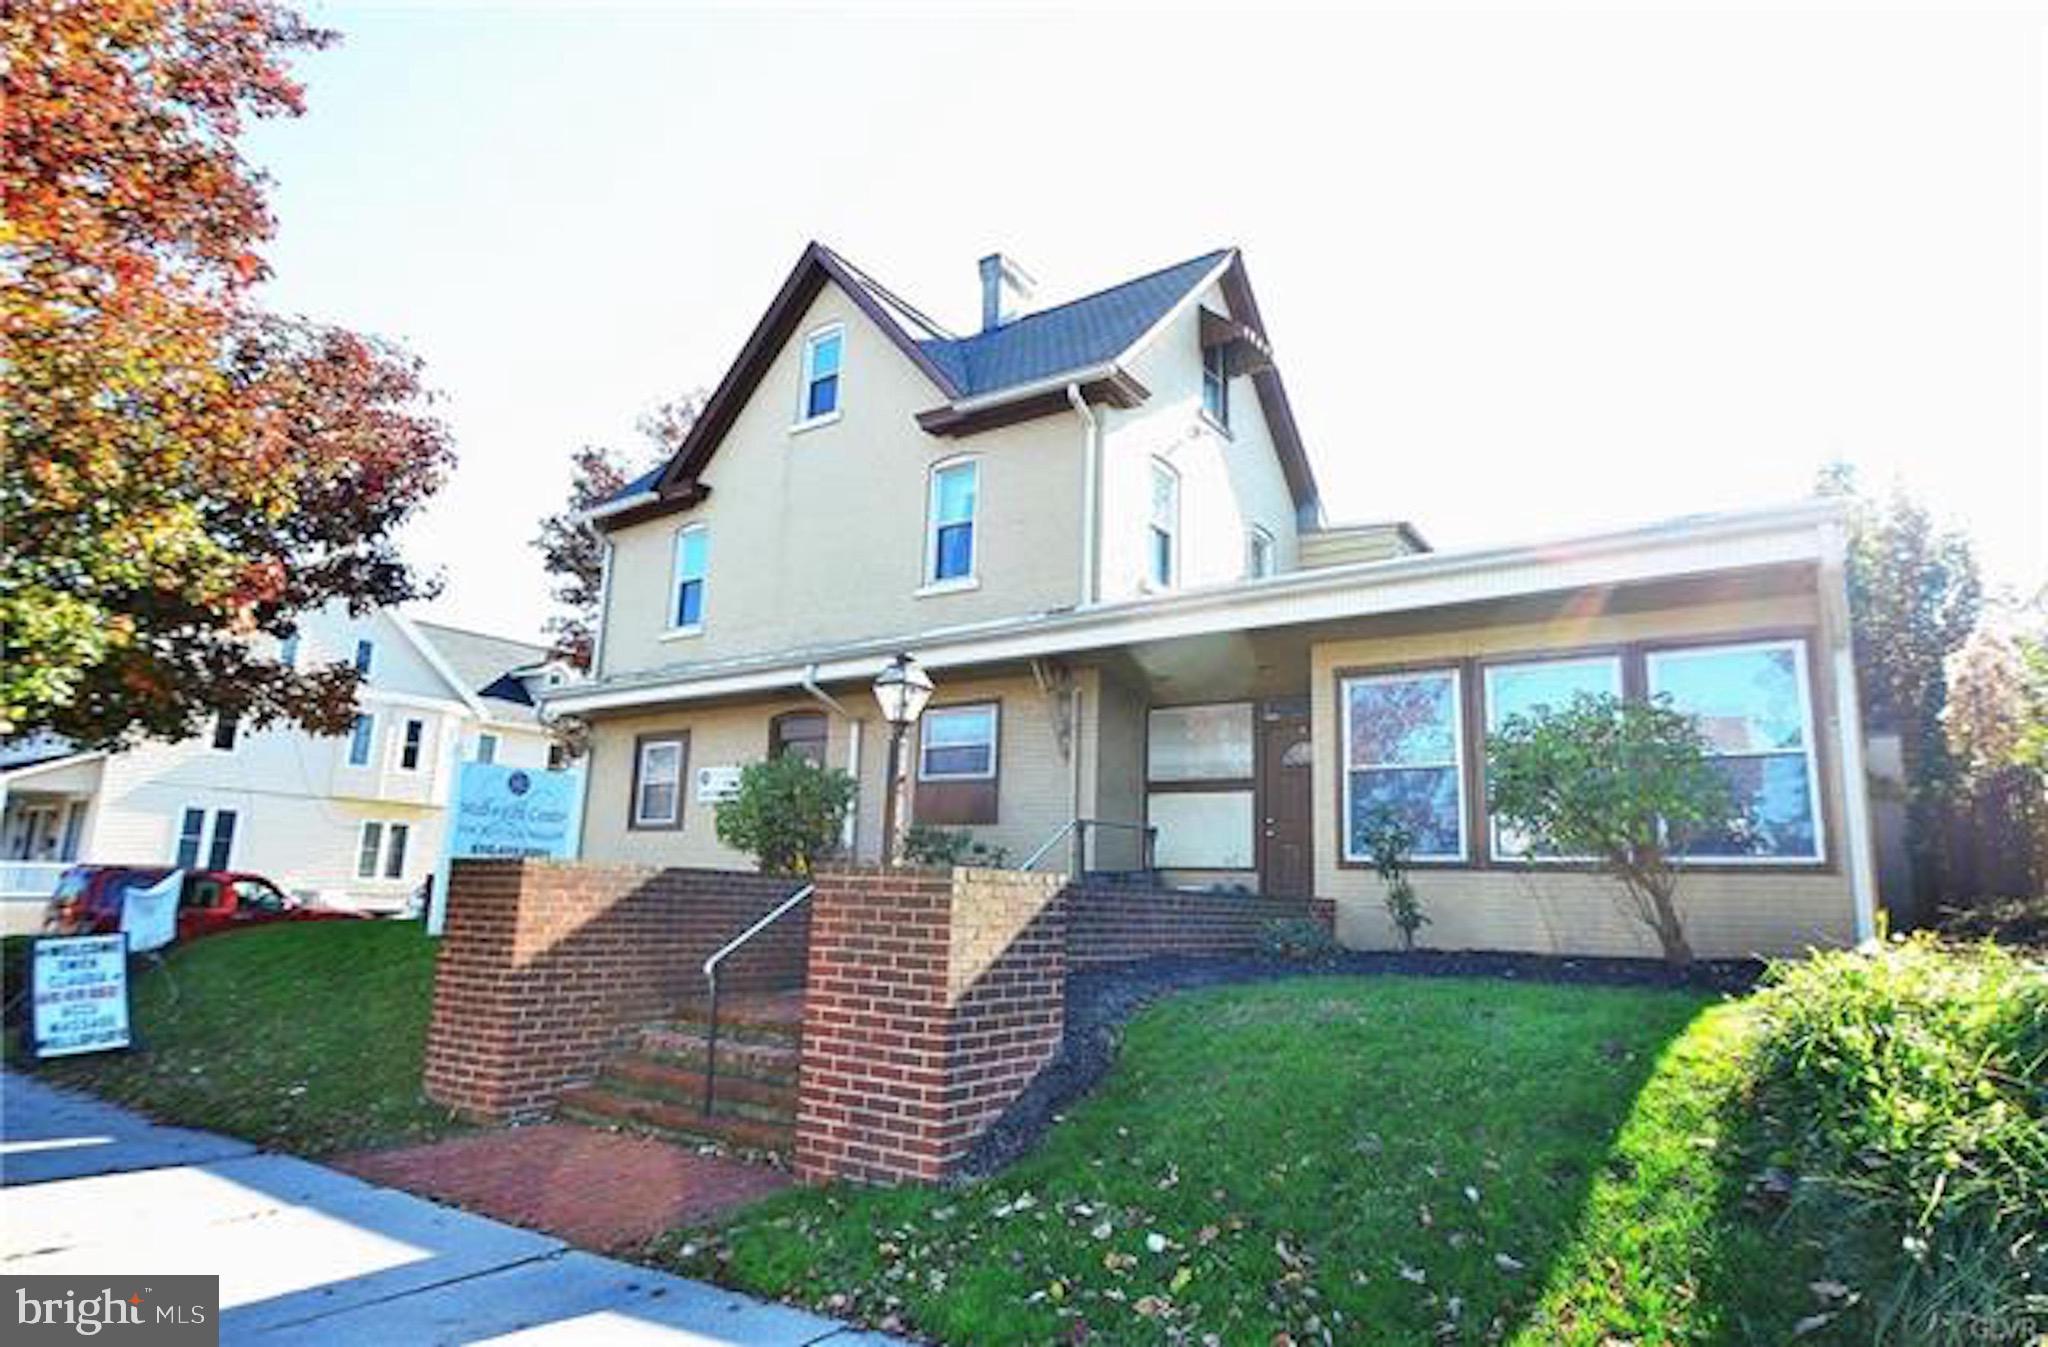 801 W BROAD STREET, BETHLEHEM, PA 18018